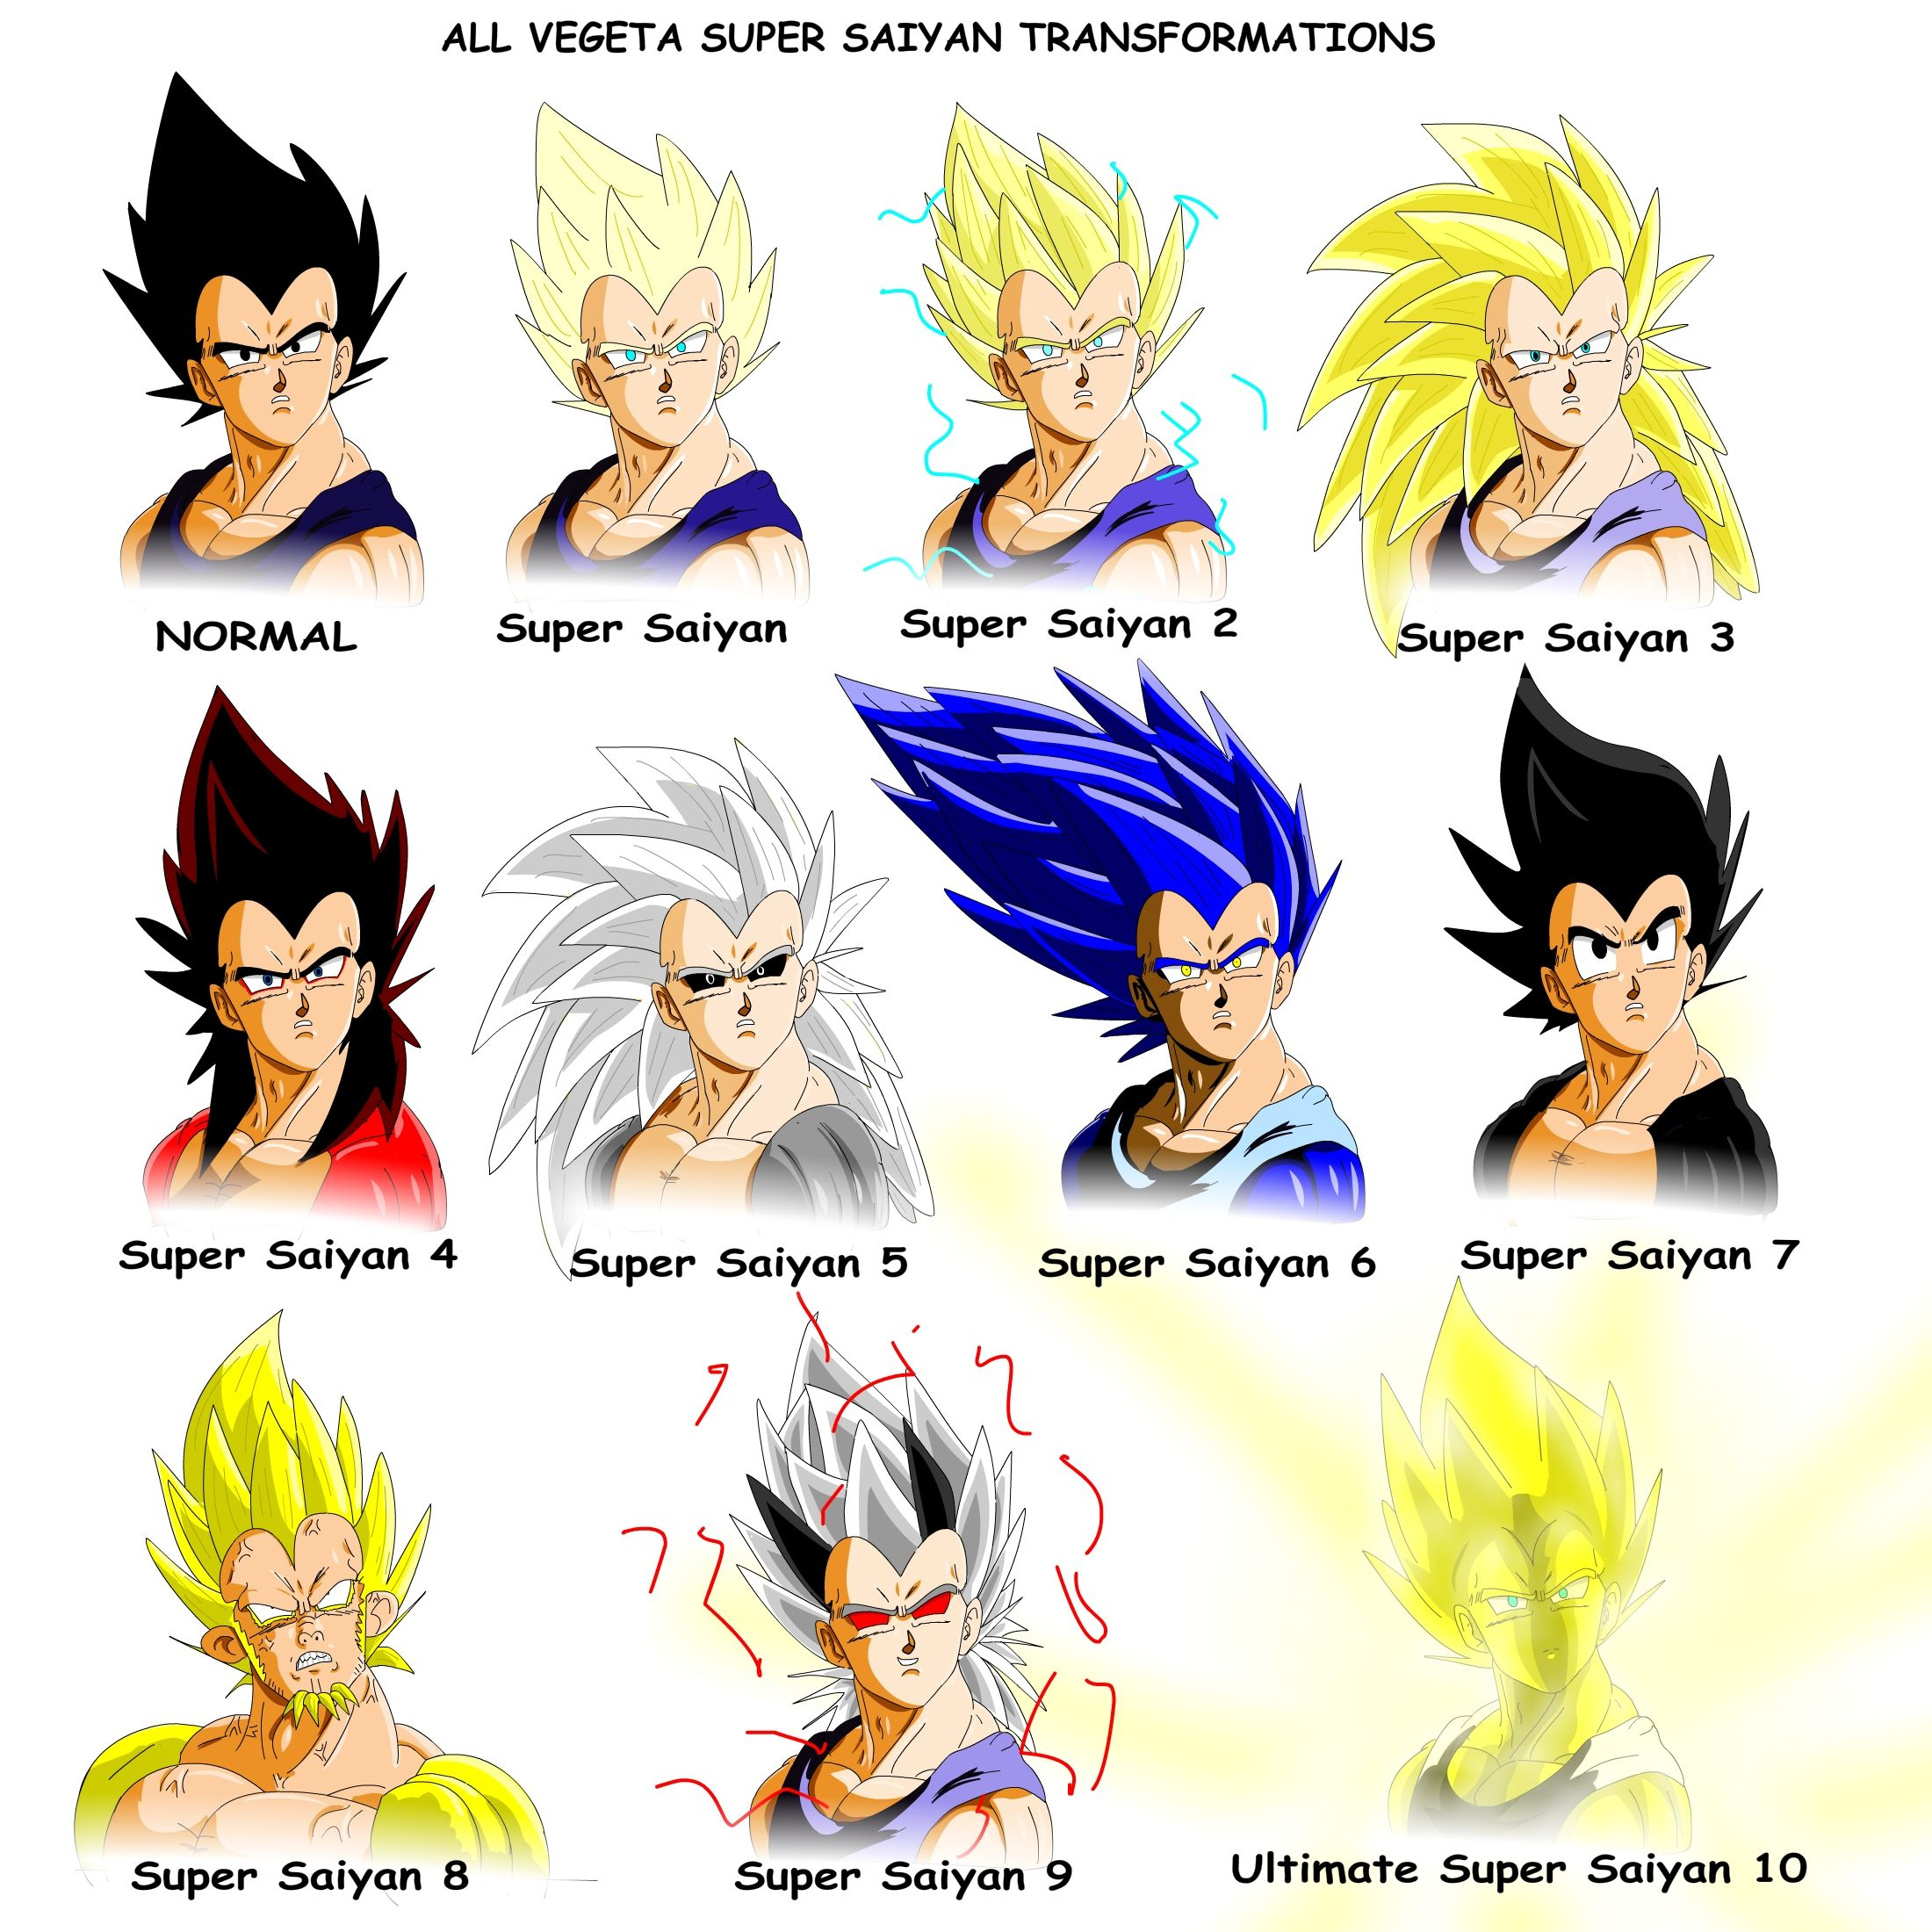 Bulma S Hair Styles All Vegeta Super Saiyan